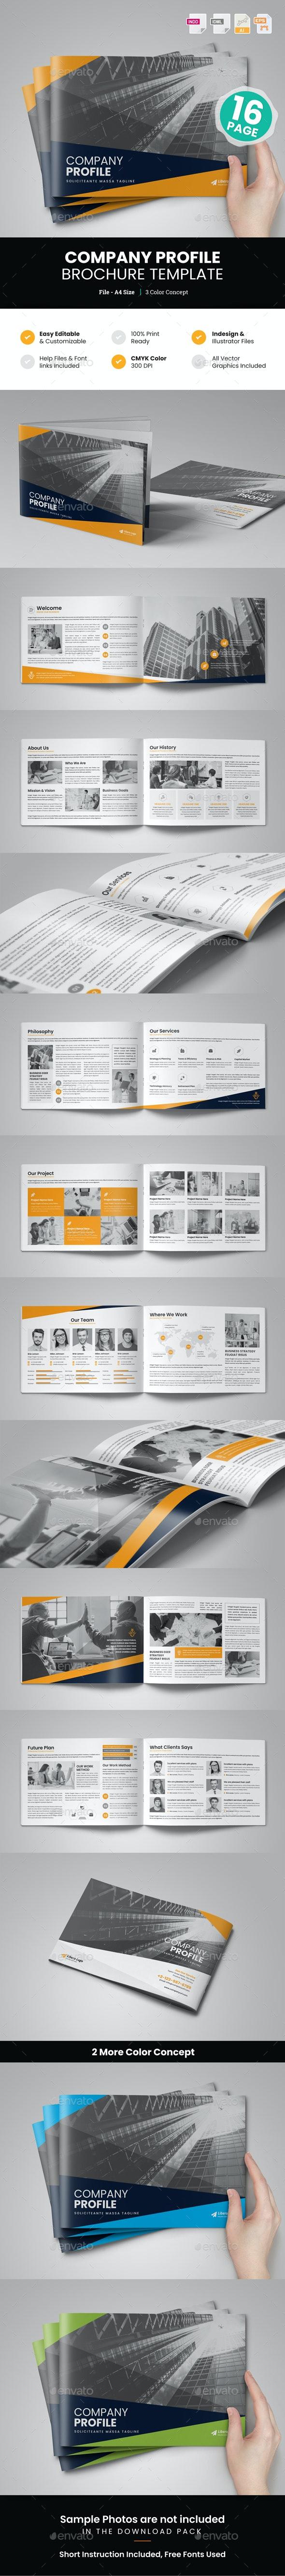 Company Profile Brochure Design v6 - Corporate Brochures